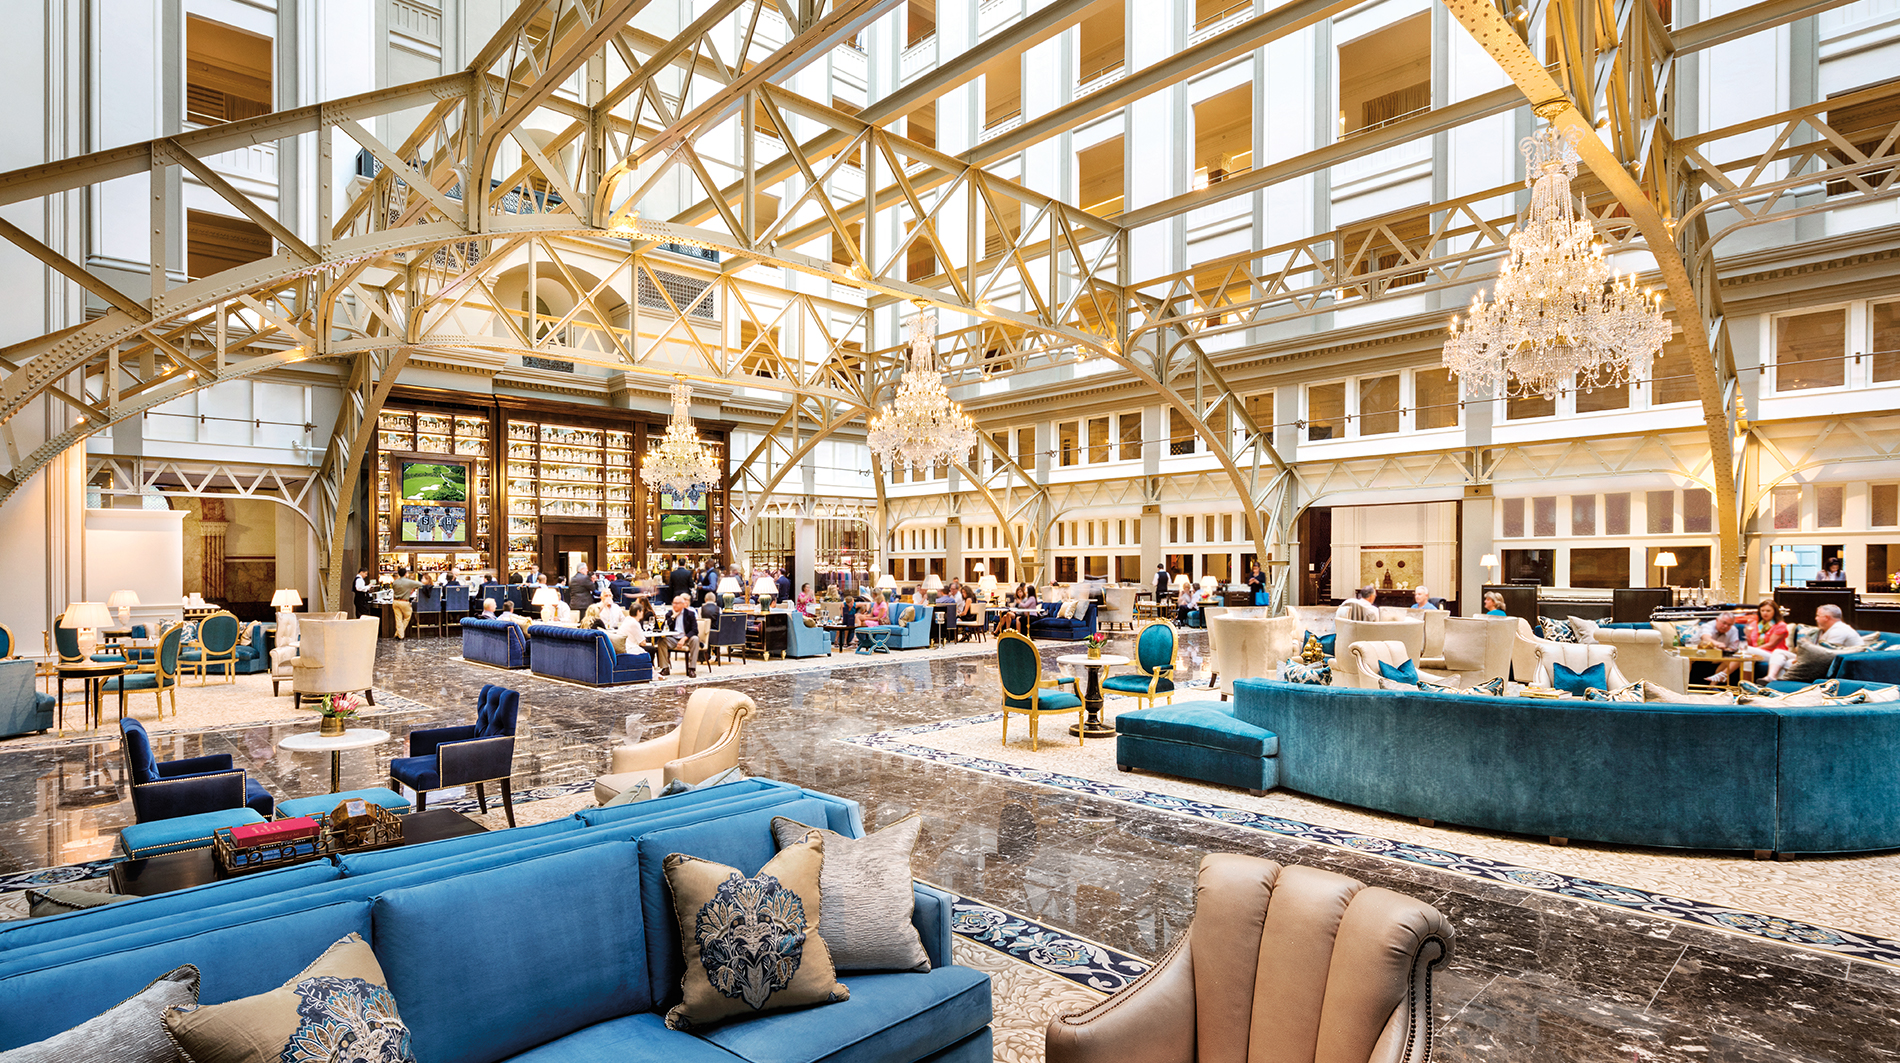 Trump international hotel washington dc Benjamin grand lobby